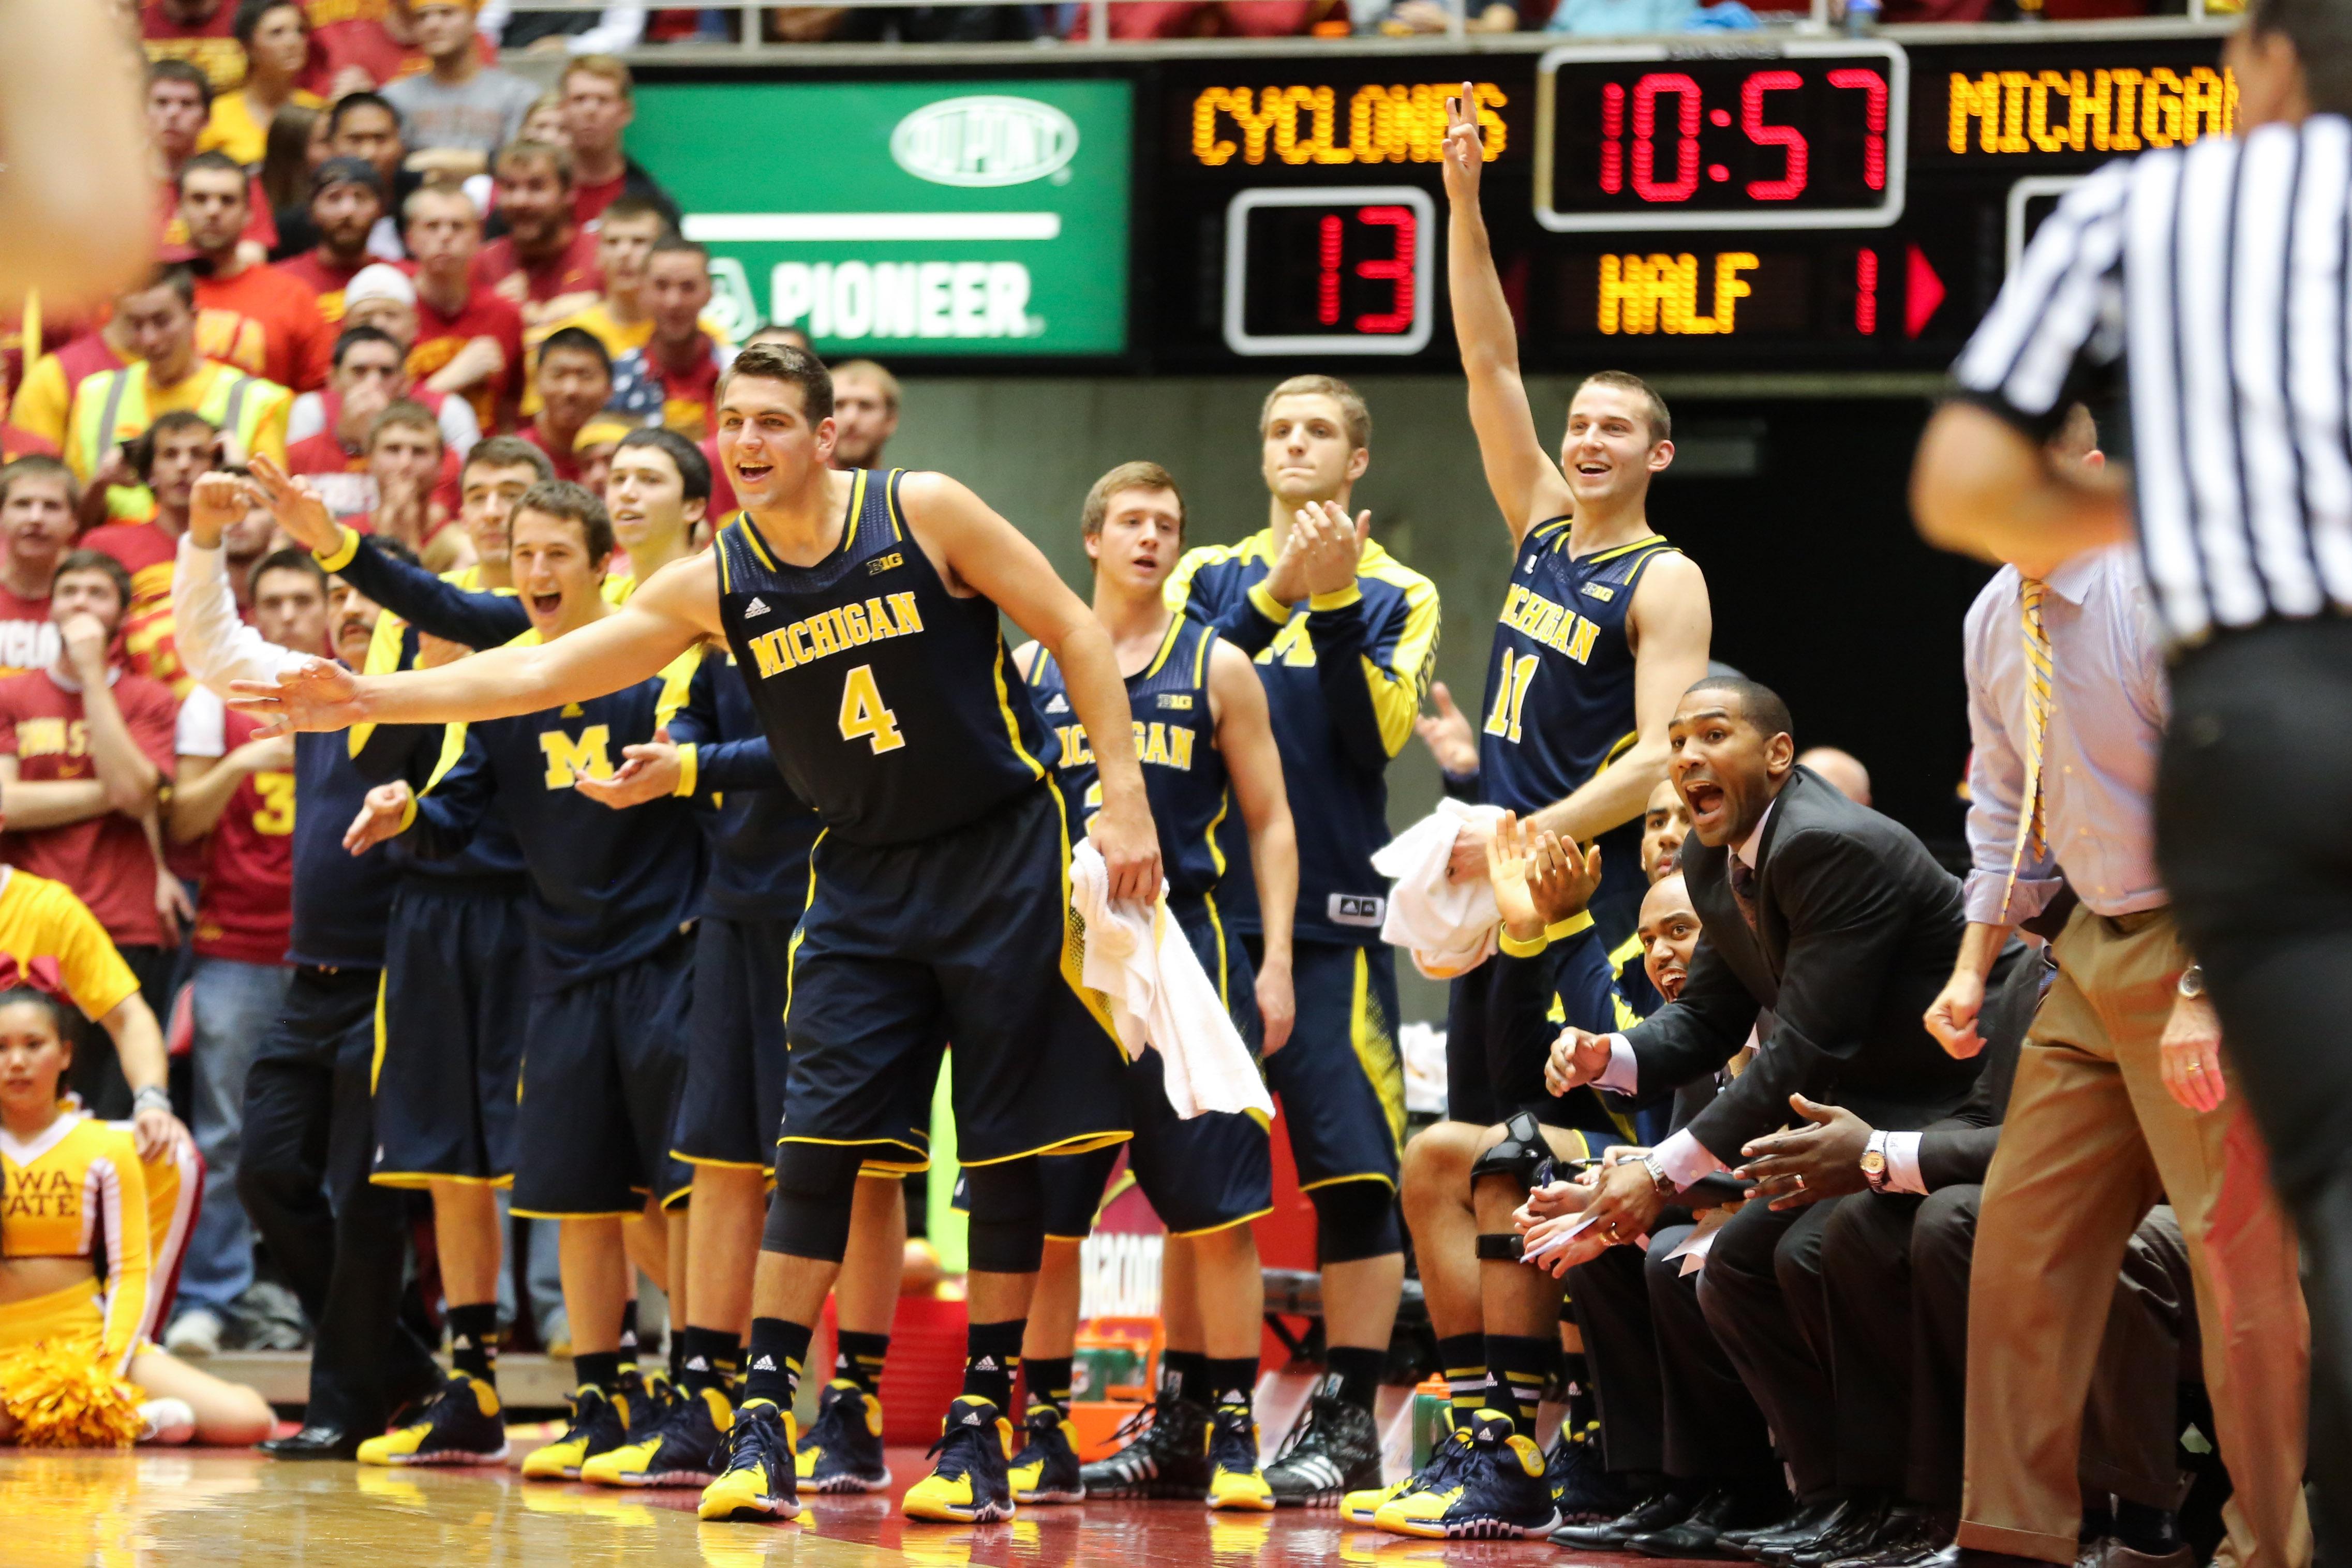 Iowa State 77, Michigan 70-6